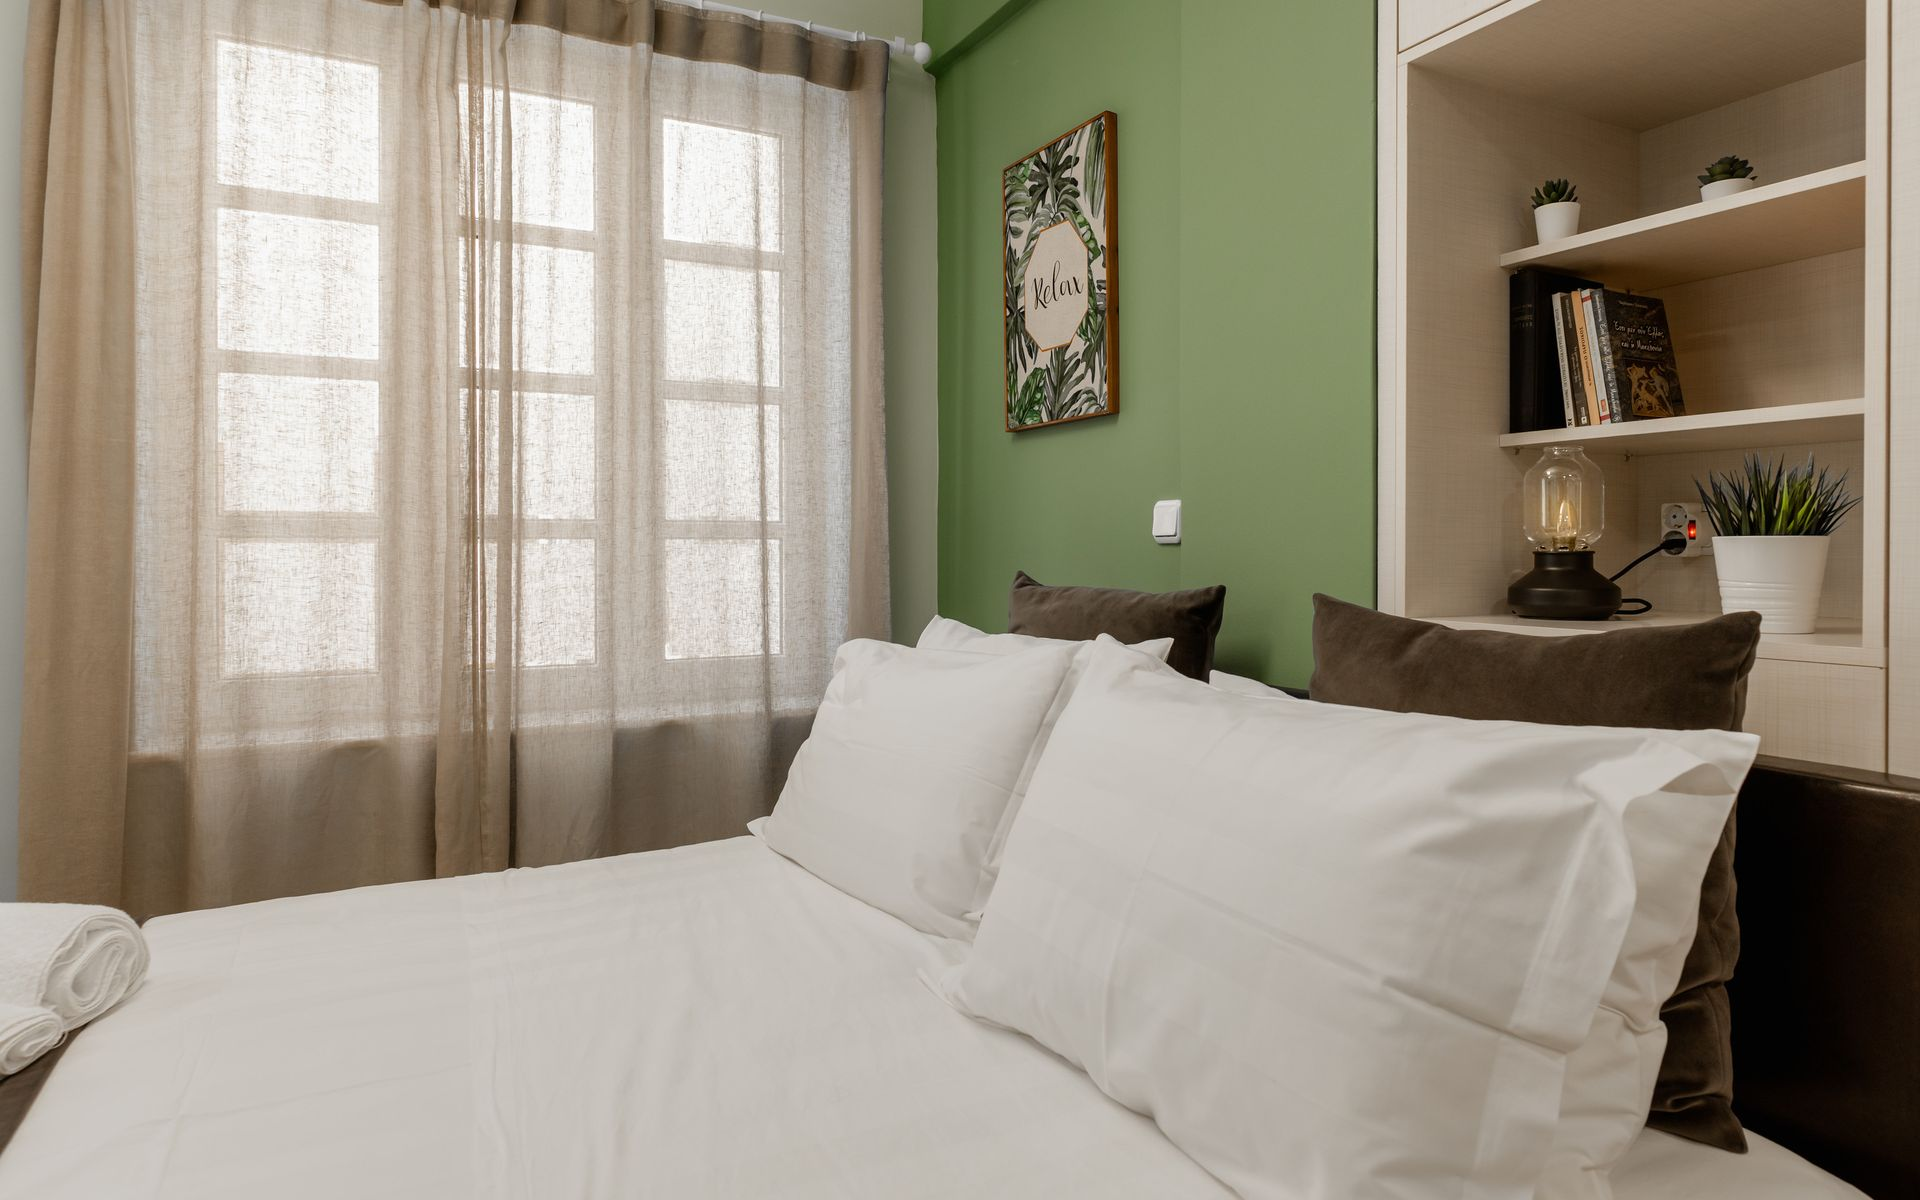 Monastiraki Urban Place by Bill & John Apartments Athens - Αθήνα ✦ 4 Ημέρες (3 Διανυκτερεύσεις) ✦ 2 άτομα ✦ Χωρίς Πρωινό ✦ έως 31/03/2022 ✦ <strong>Επιλέξτε 4 διανυκτερεύσεις και πληρώστε μόνο τις 3!</strong>